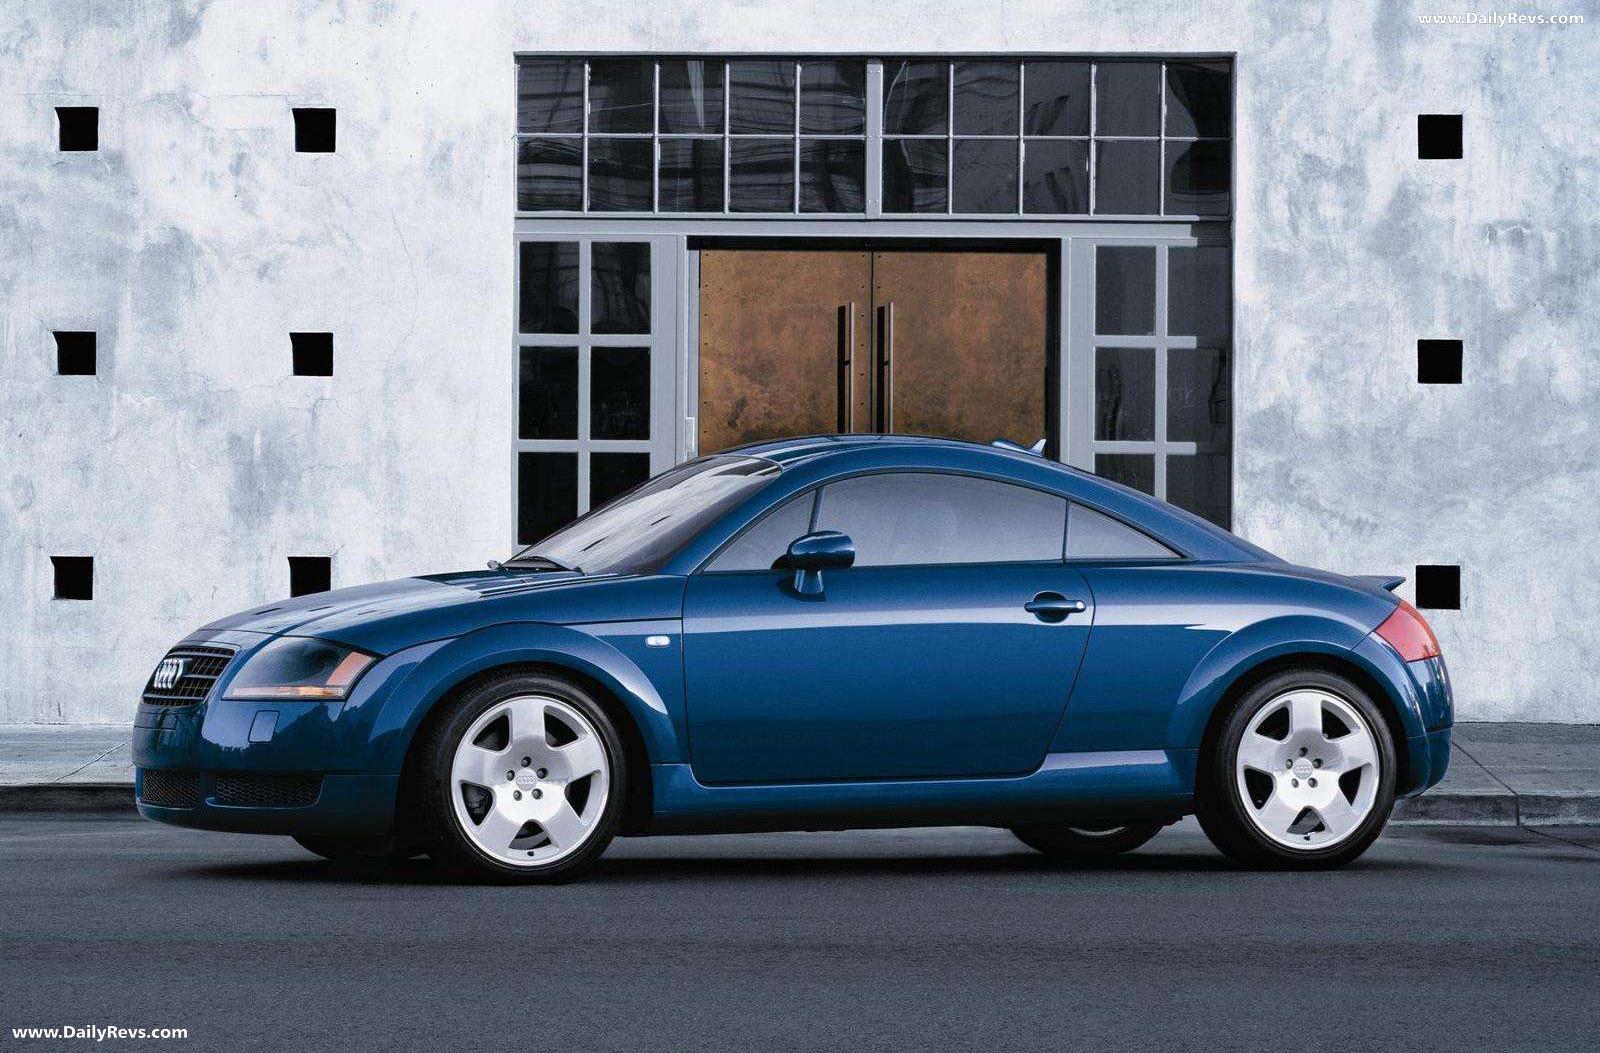 Kelebihan Audi Tt 2005 Murah Berkualitas